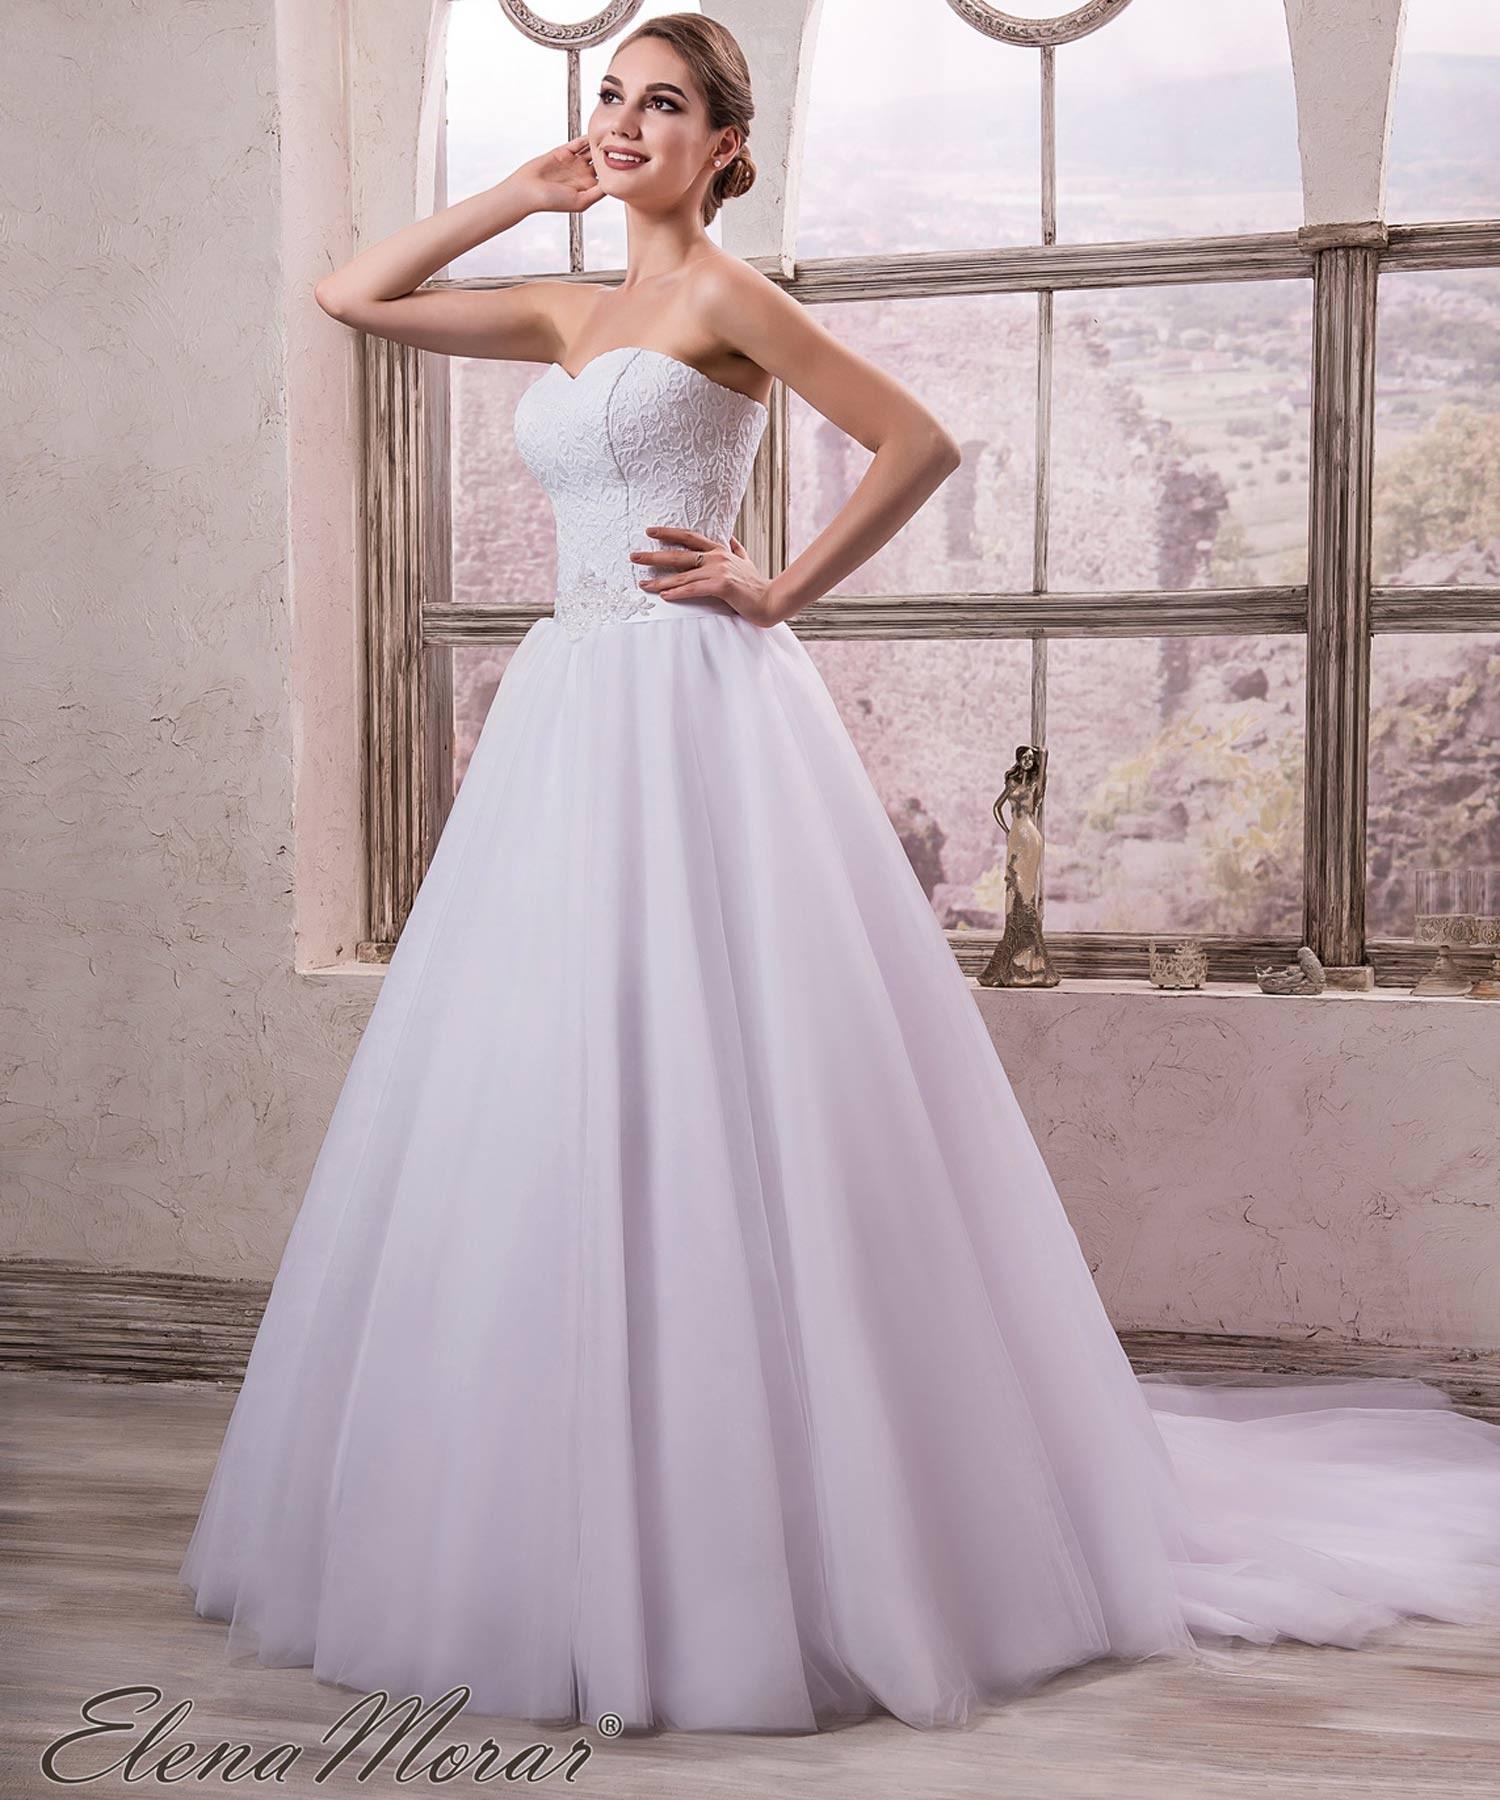 Robe de mariée princesse bustier cœur dentelle Anya